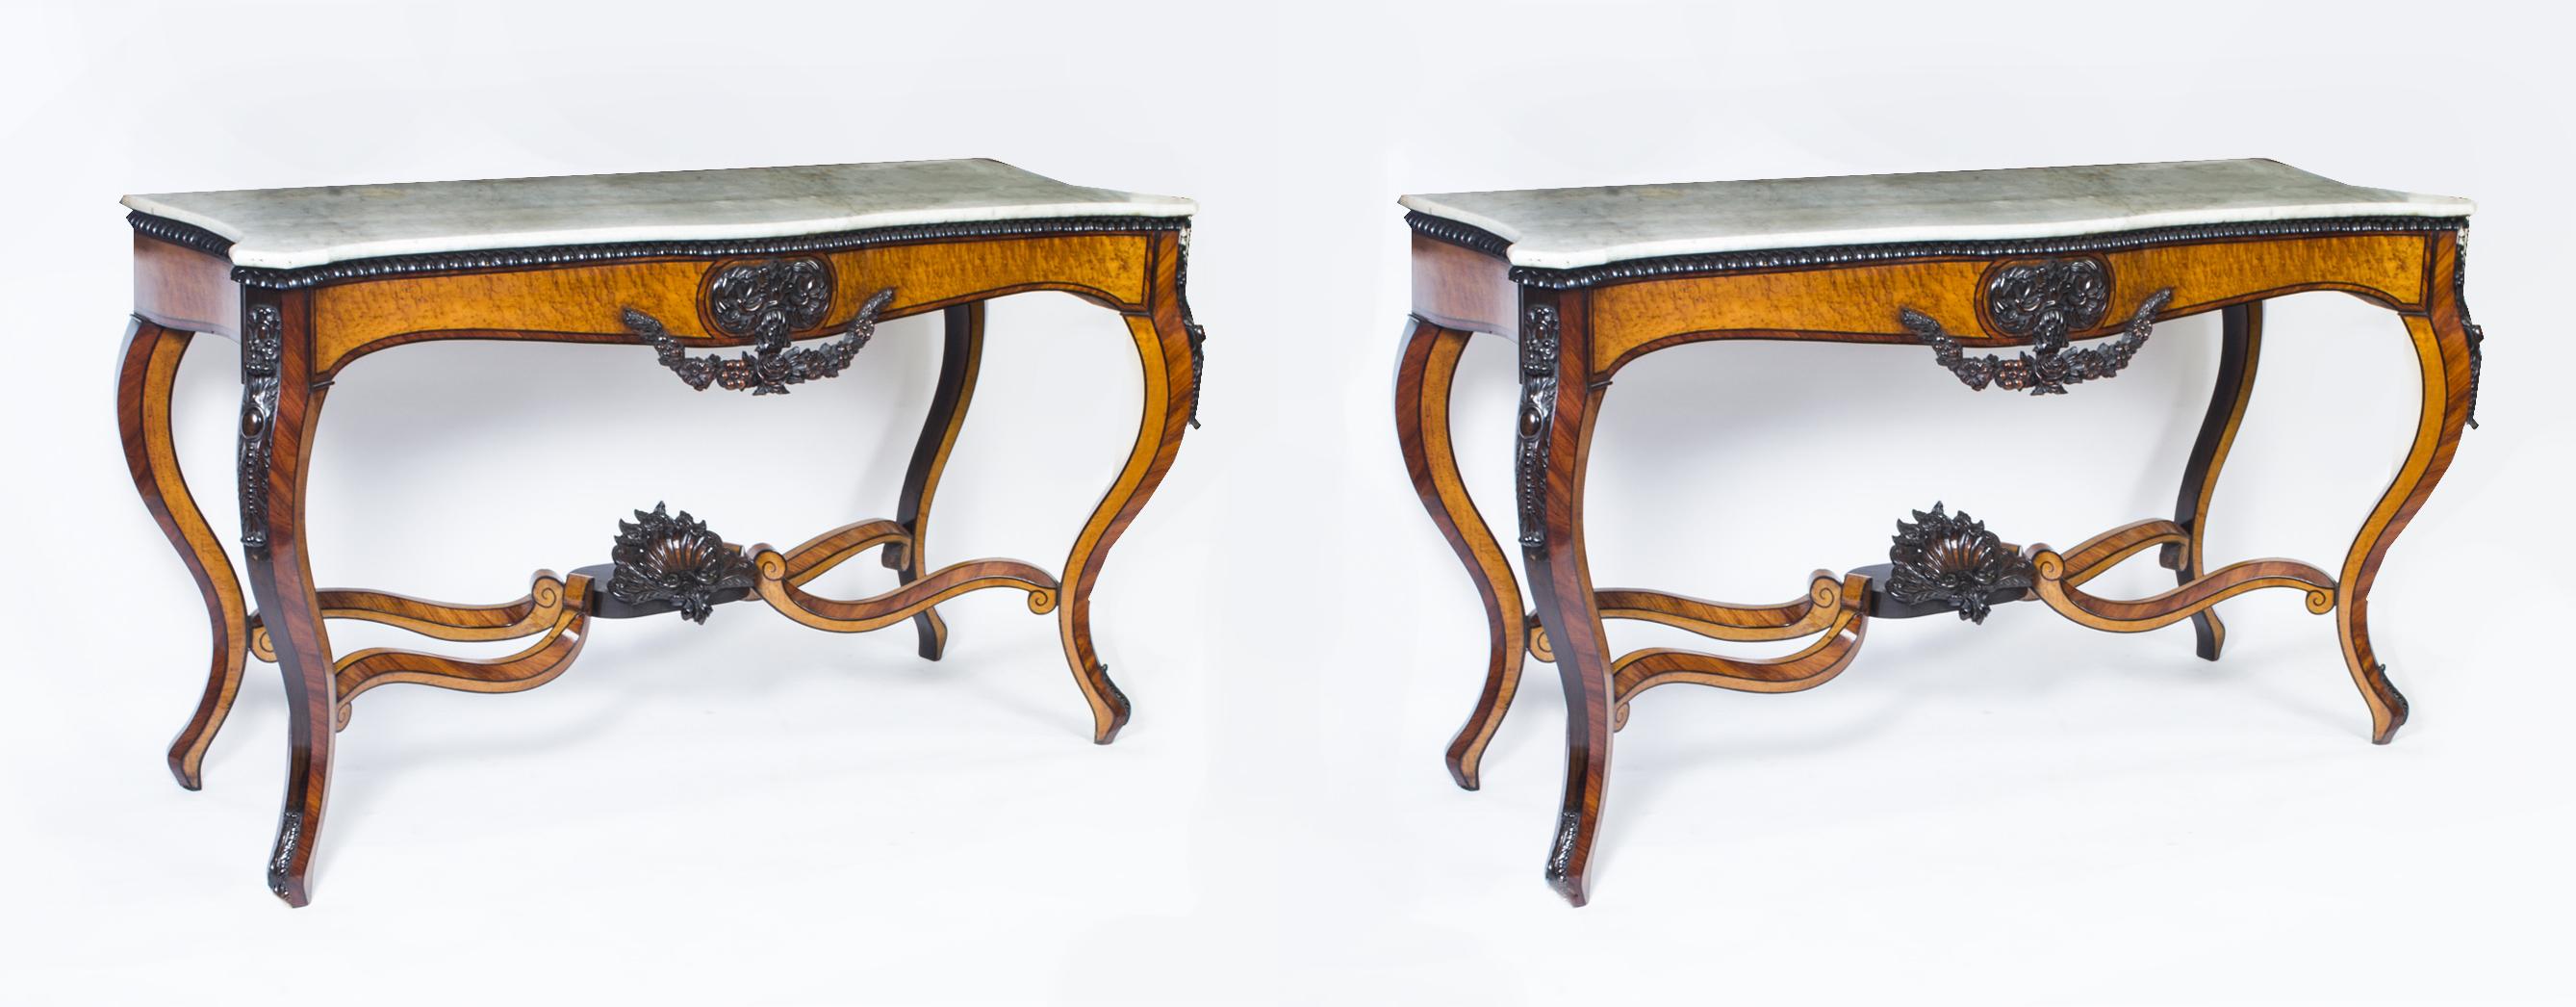 Regent antiques console tables antique pair 5ft6 for 5 foot console table